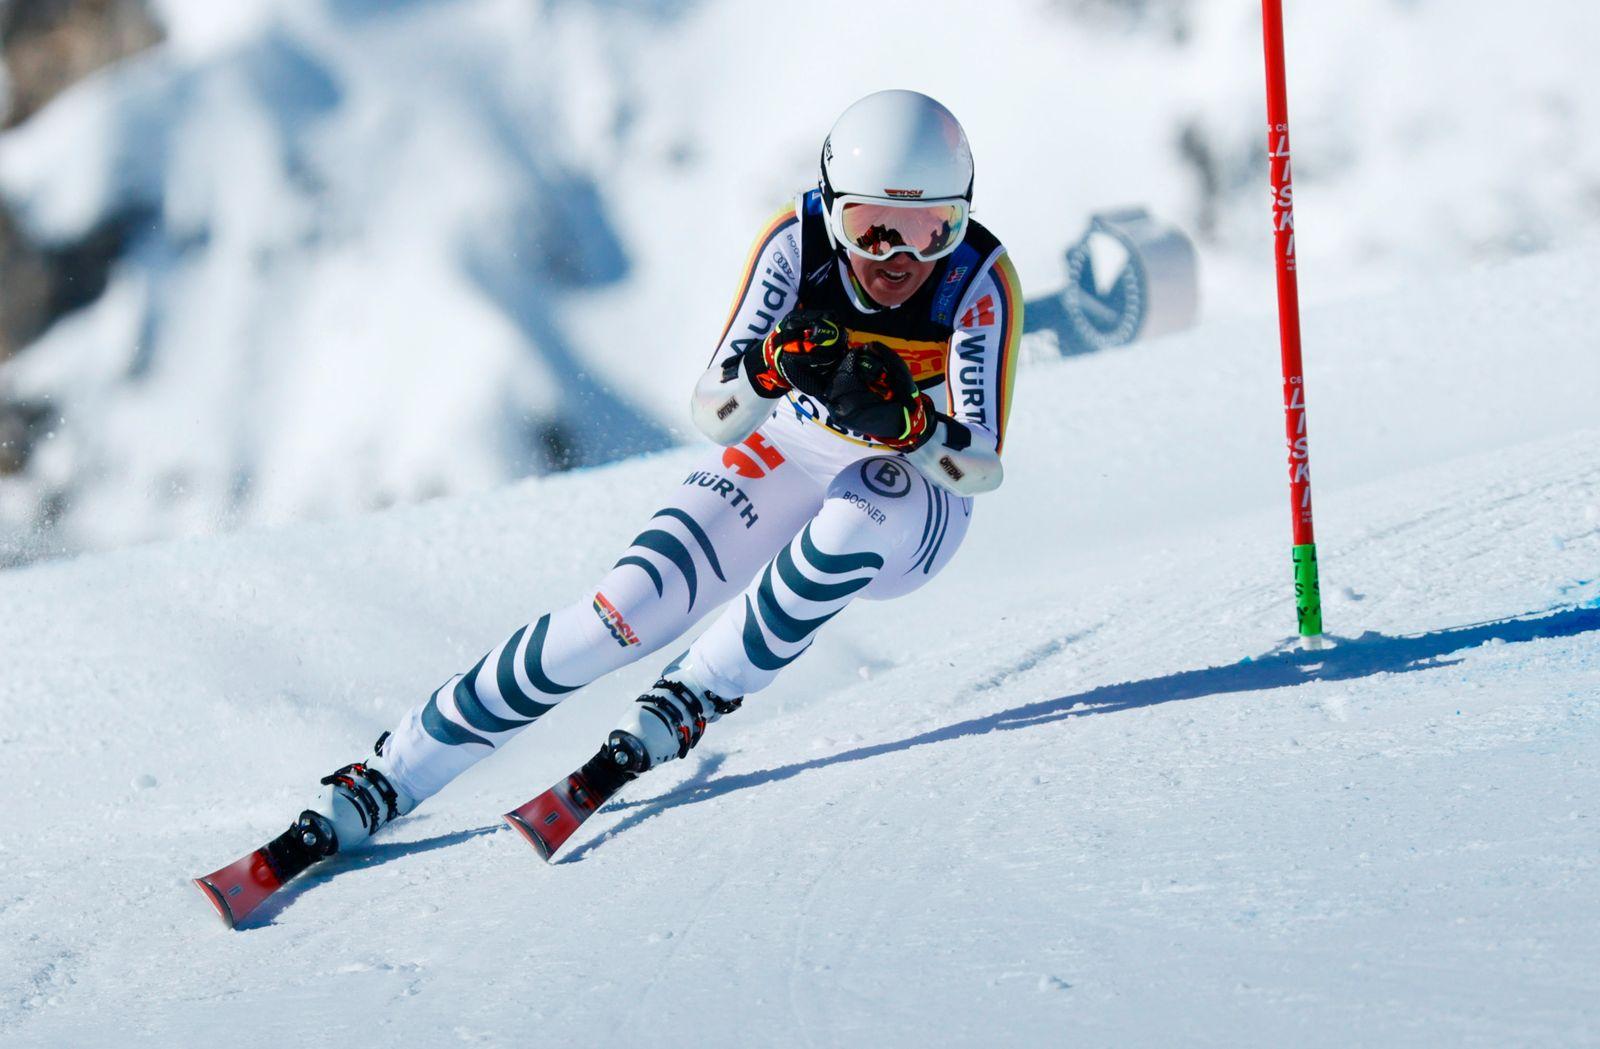 FIS Alpine Ski World Championships